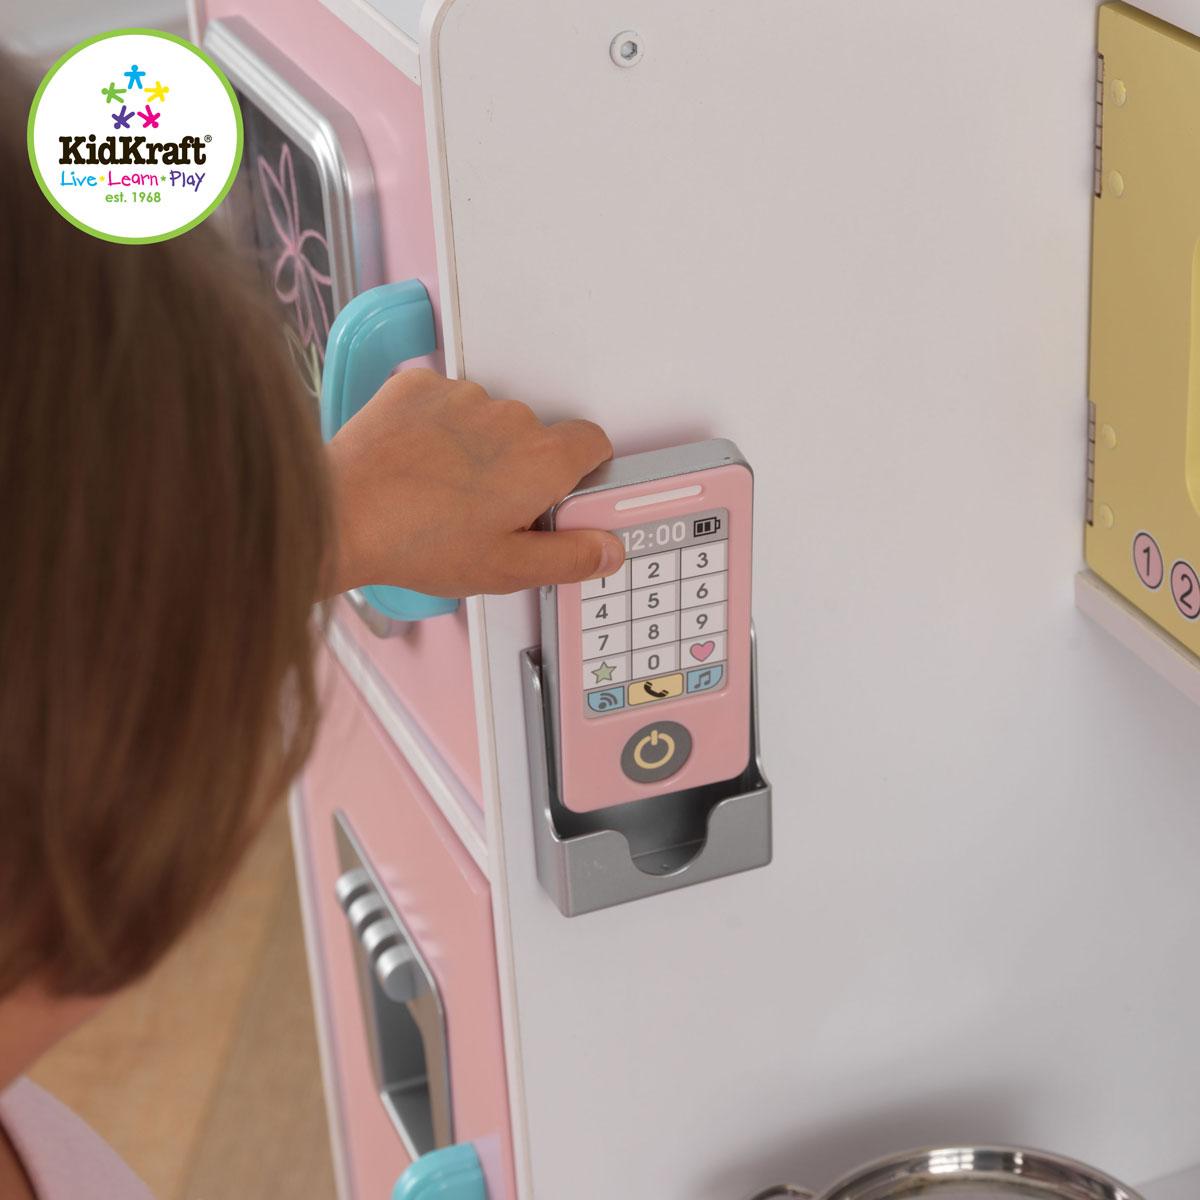 Kidkraft Pastellfarbene Küche Uptown 53257 | Kidkraft Kuche Uptown In Pastellfarben 53257 Pirum